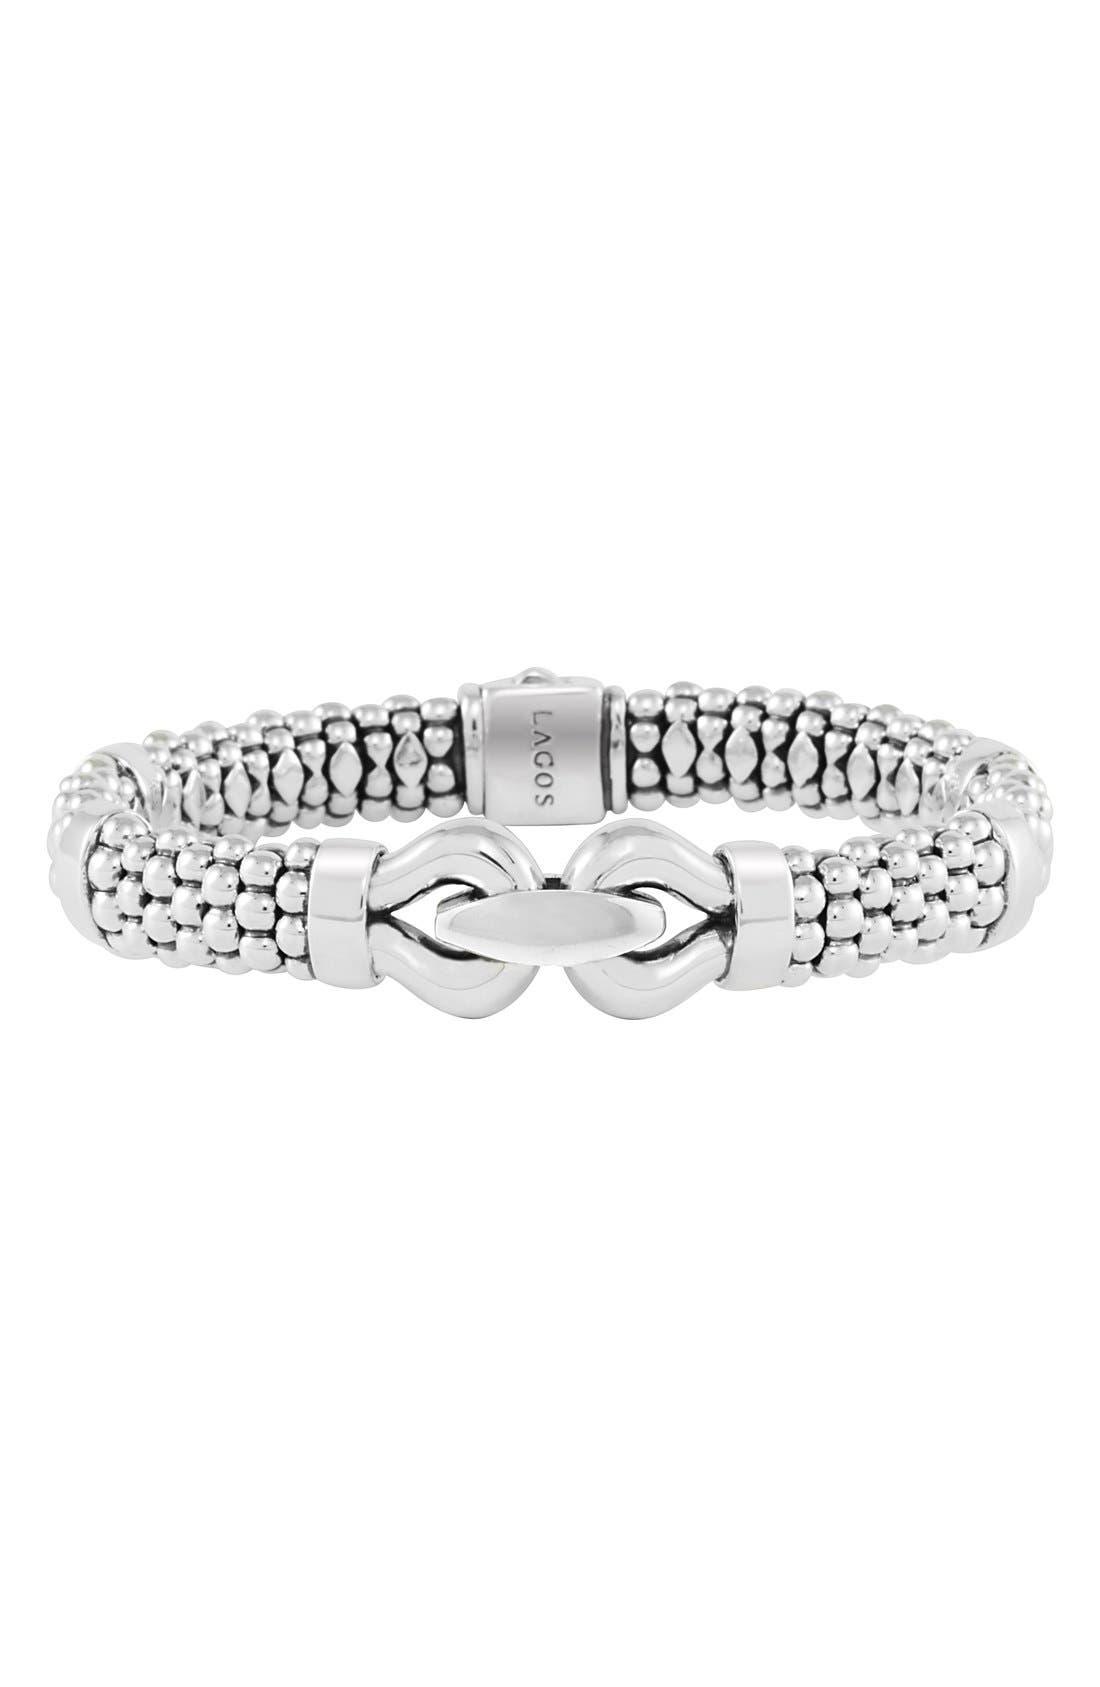 Alternate Image 1 Selected - LAGOS 'Derby' Caviar Rope Bracelet